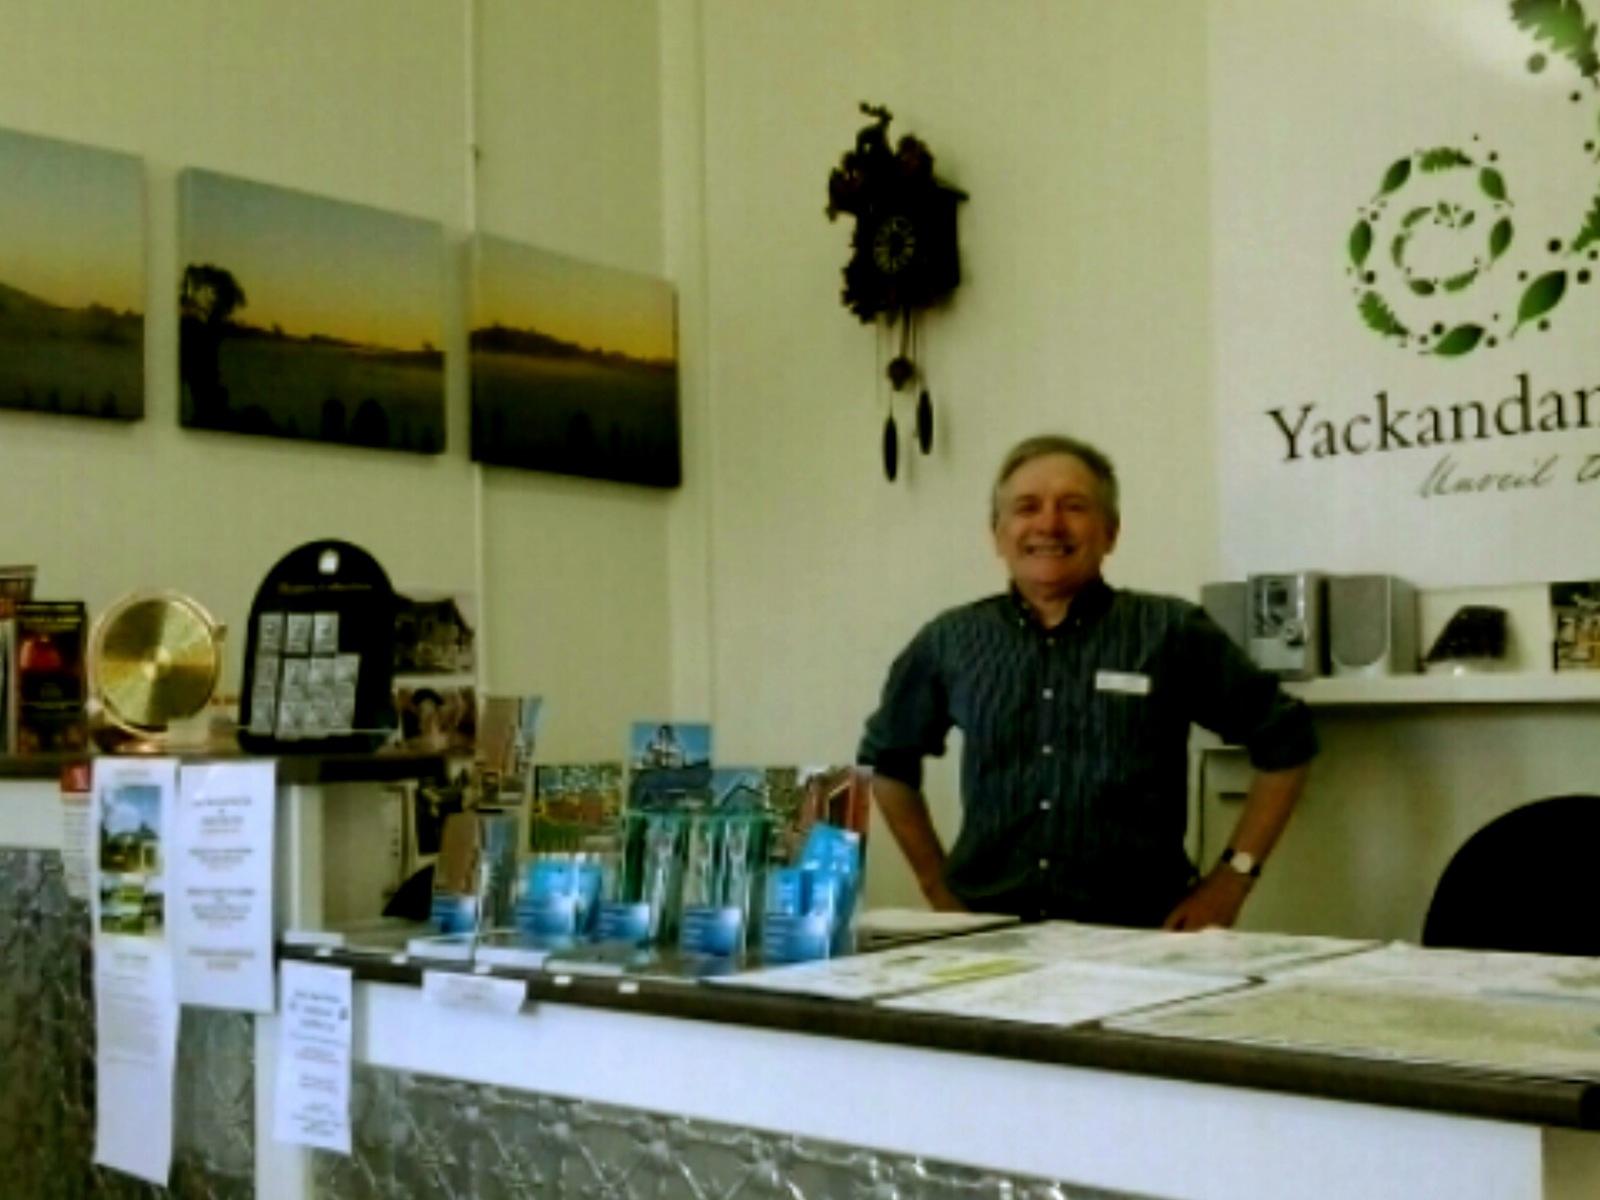 Yackandandah Visitor Centre Front Desk